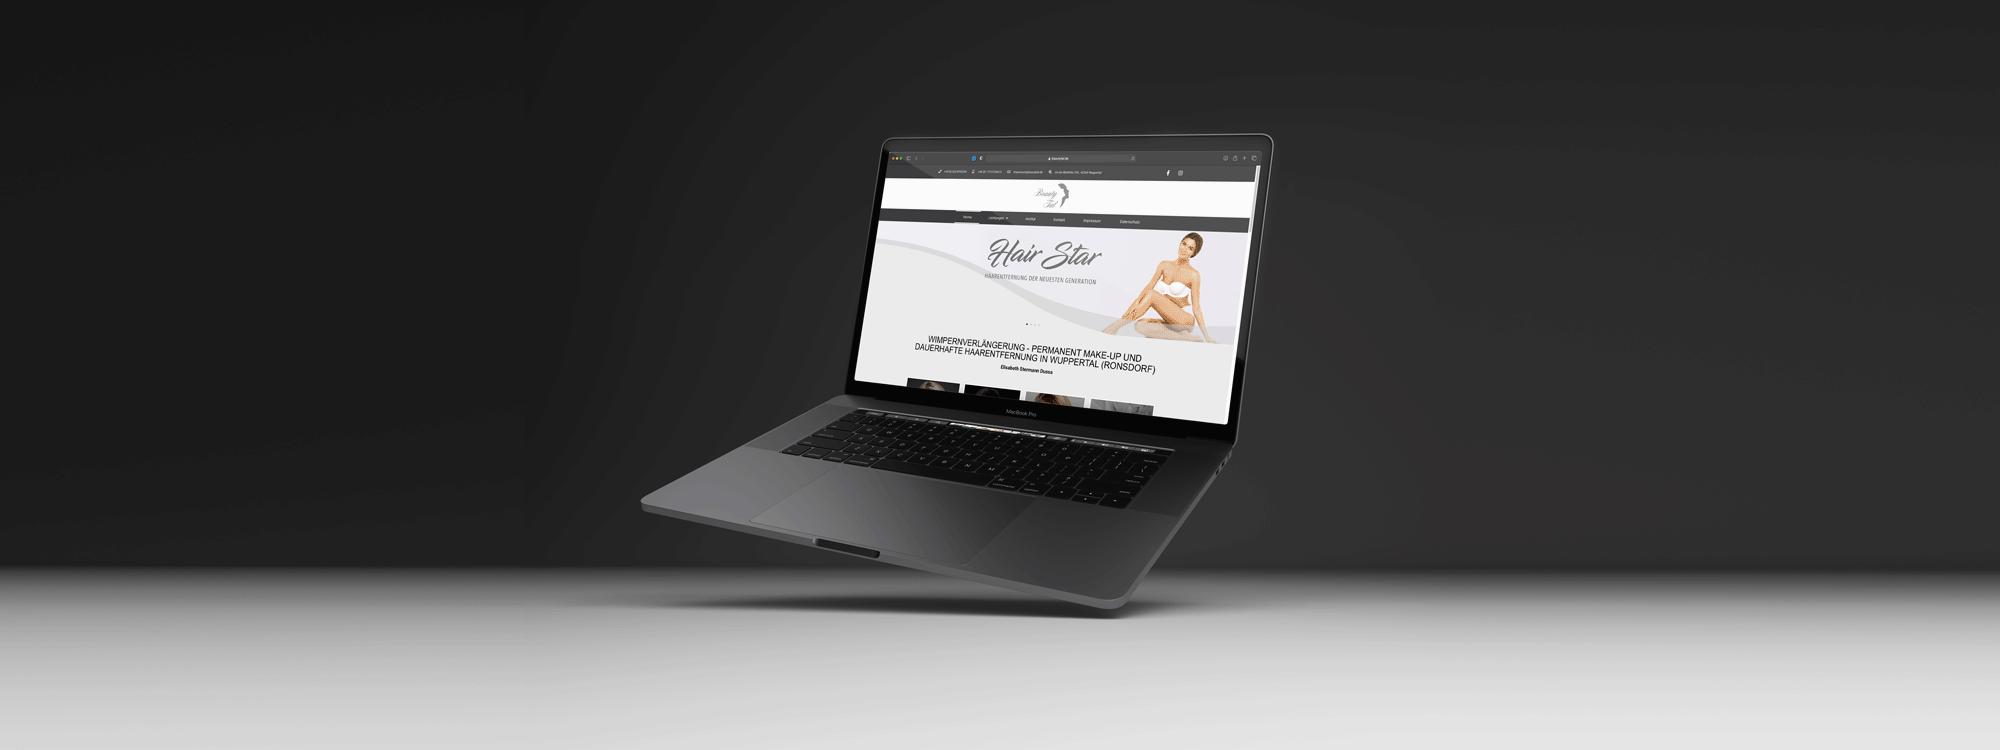 Beautytal-Wuppertal-aquarodesign-desktop-mock-up